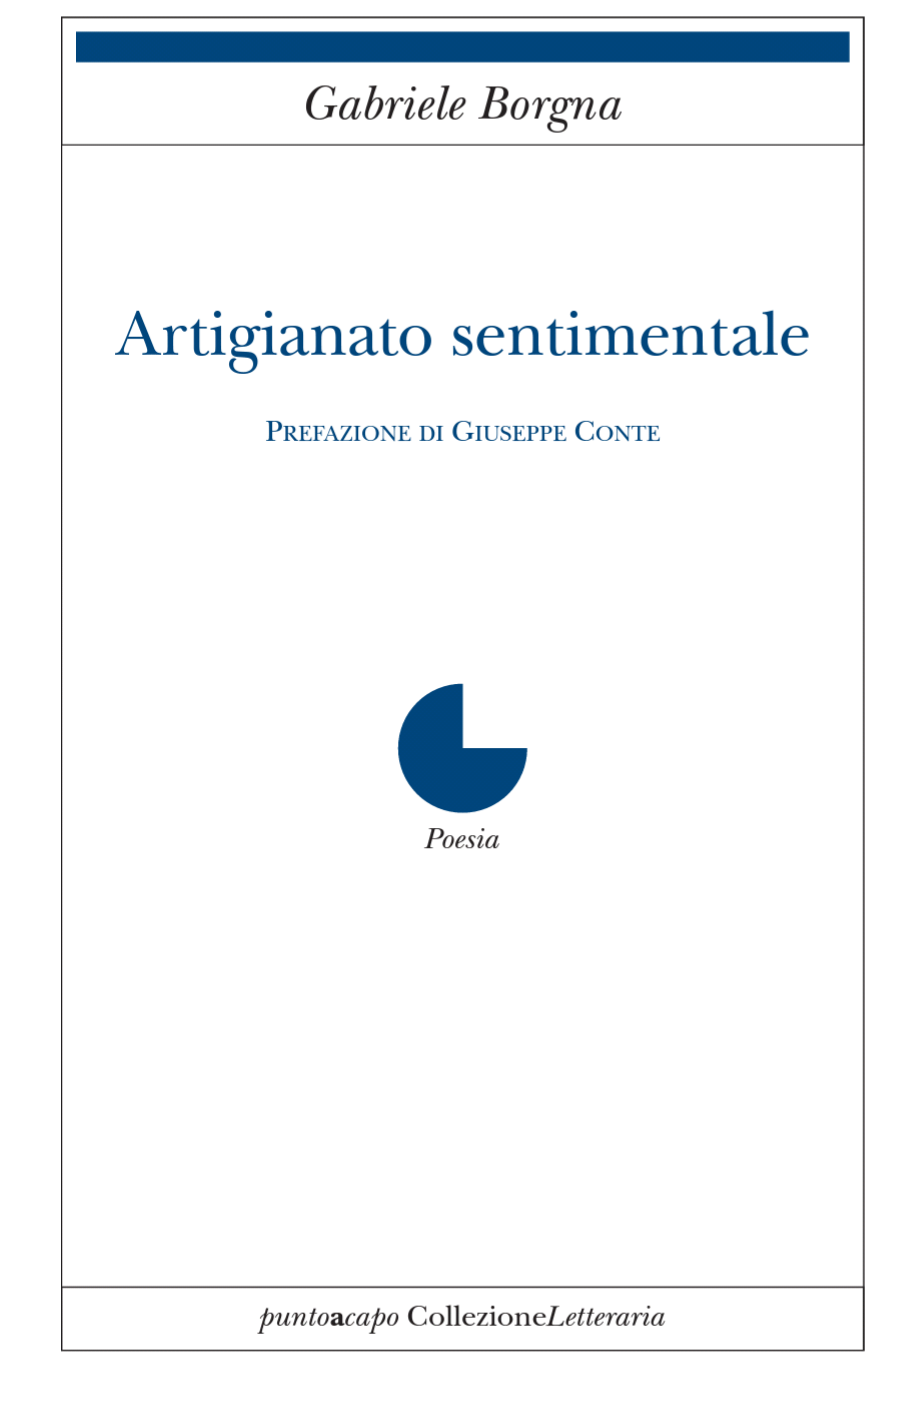 artigianosentimentaledig-borgna-1606258301.png